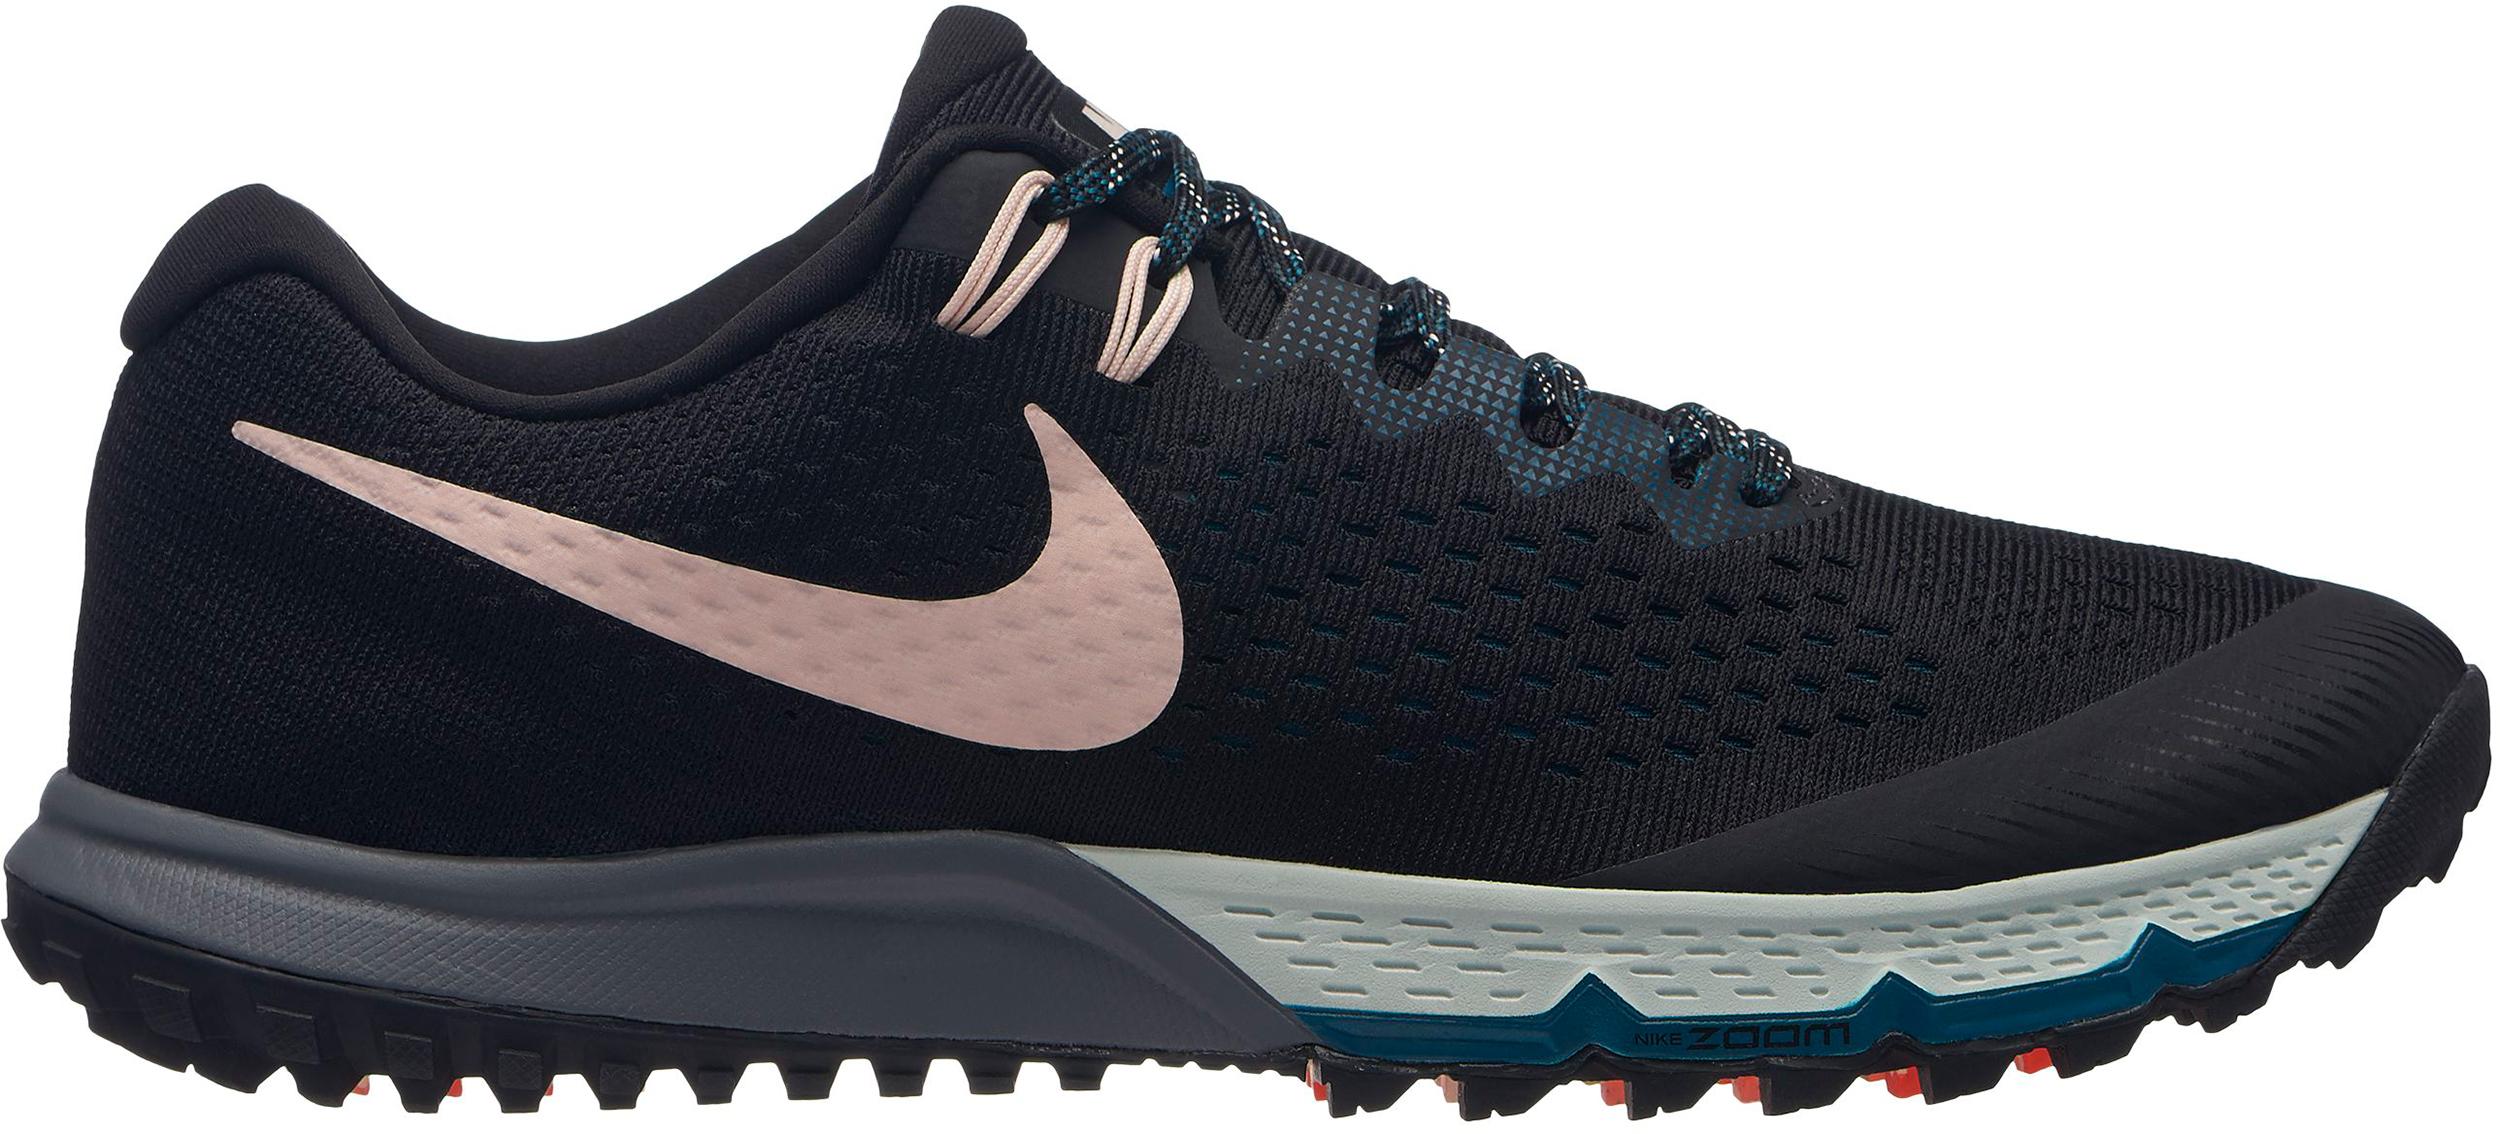 Nike Zoom Terra Kiger 4 Trail Running Shoes Men s - Men s afb0570e5